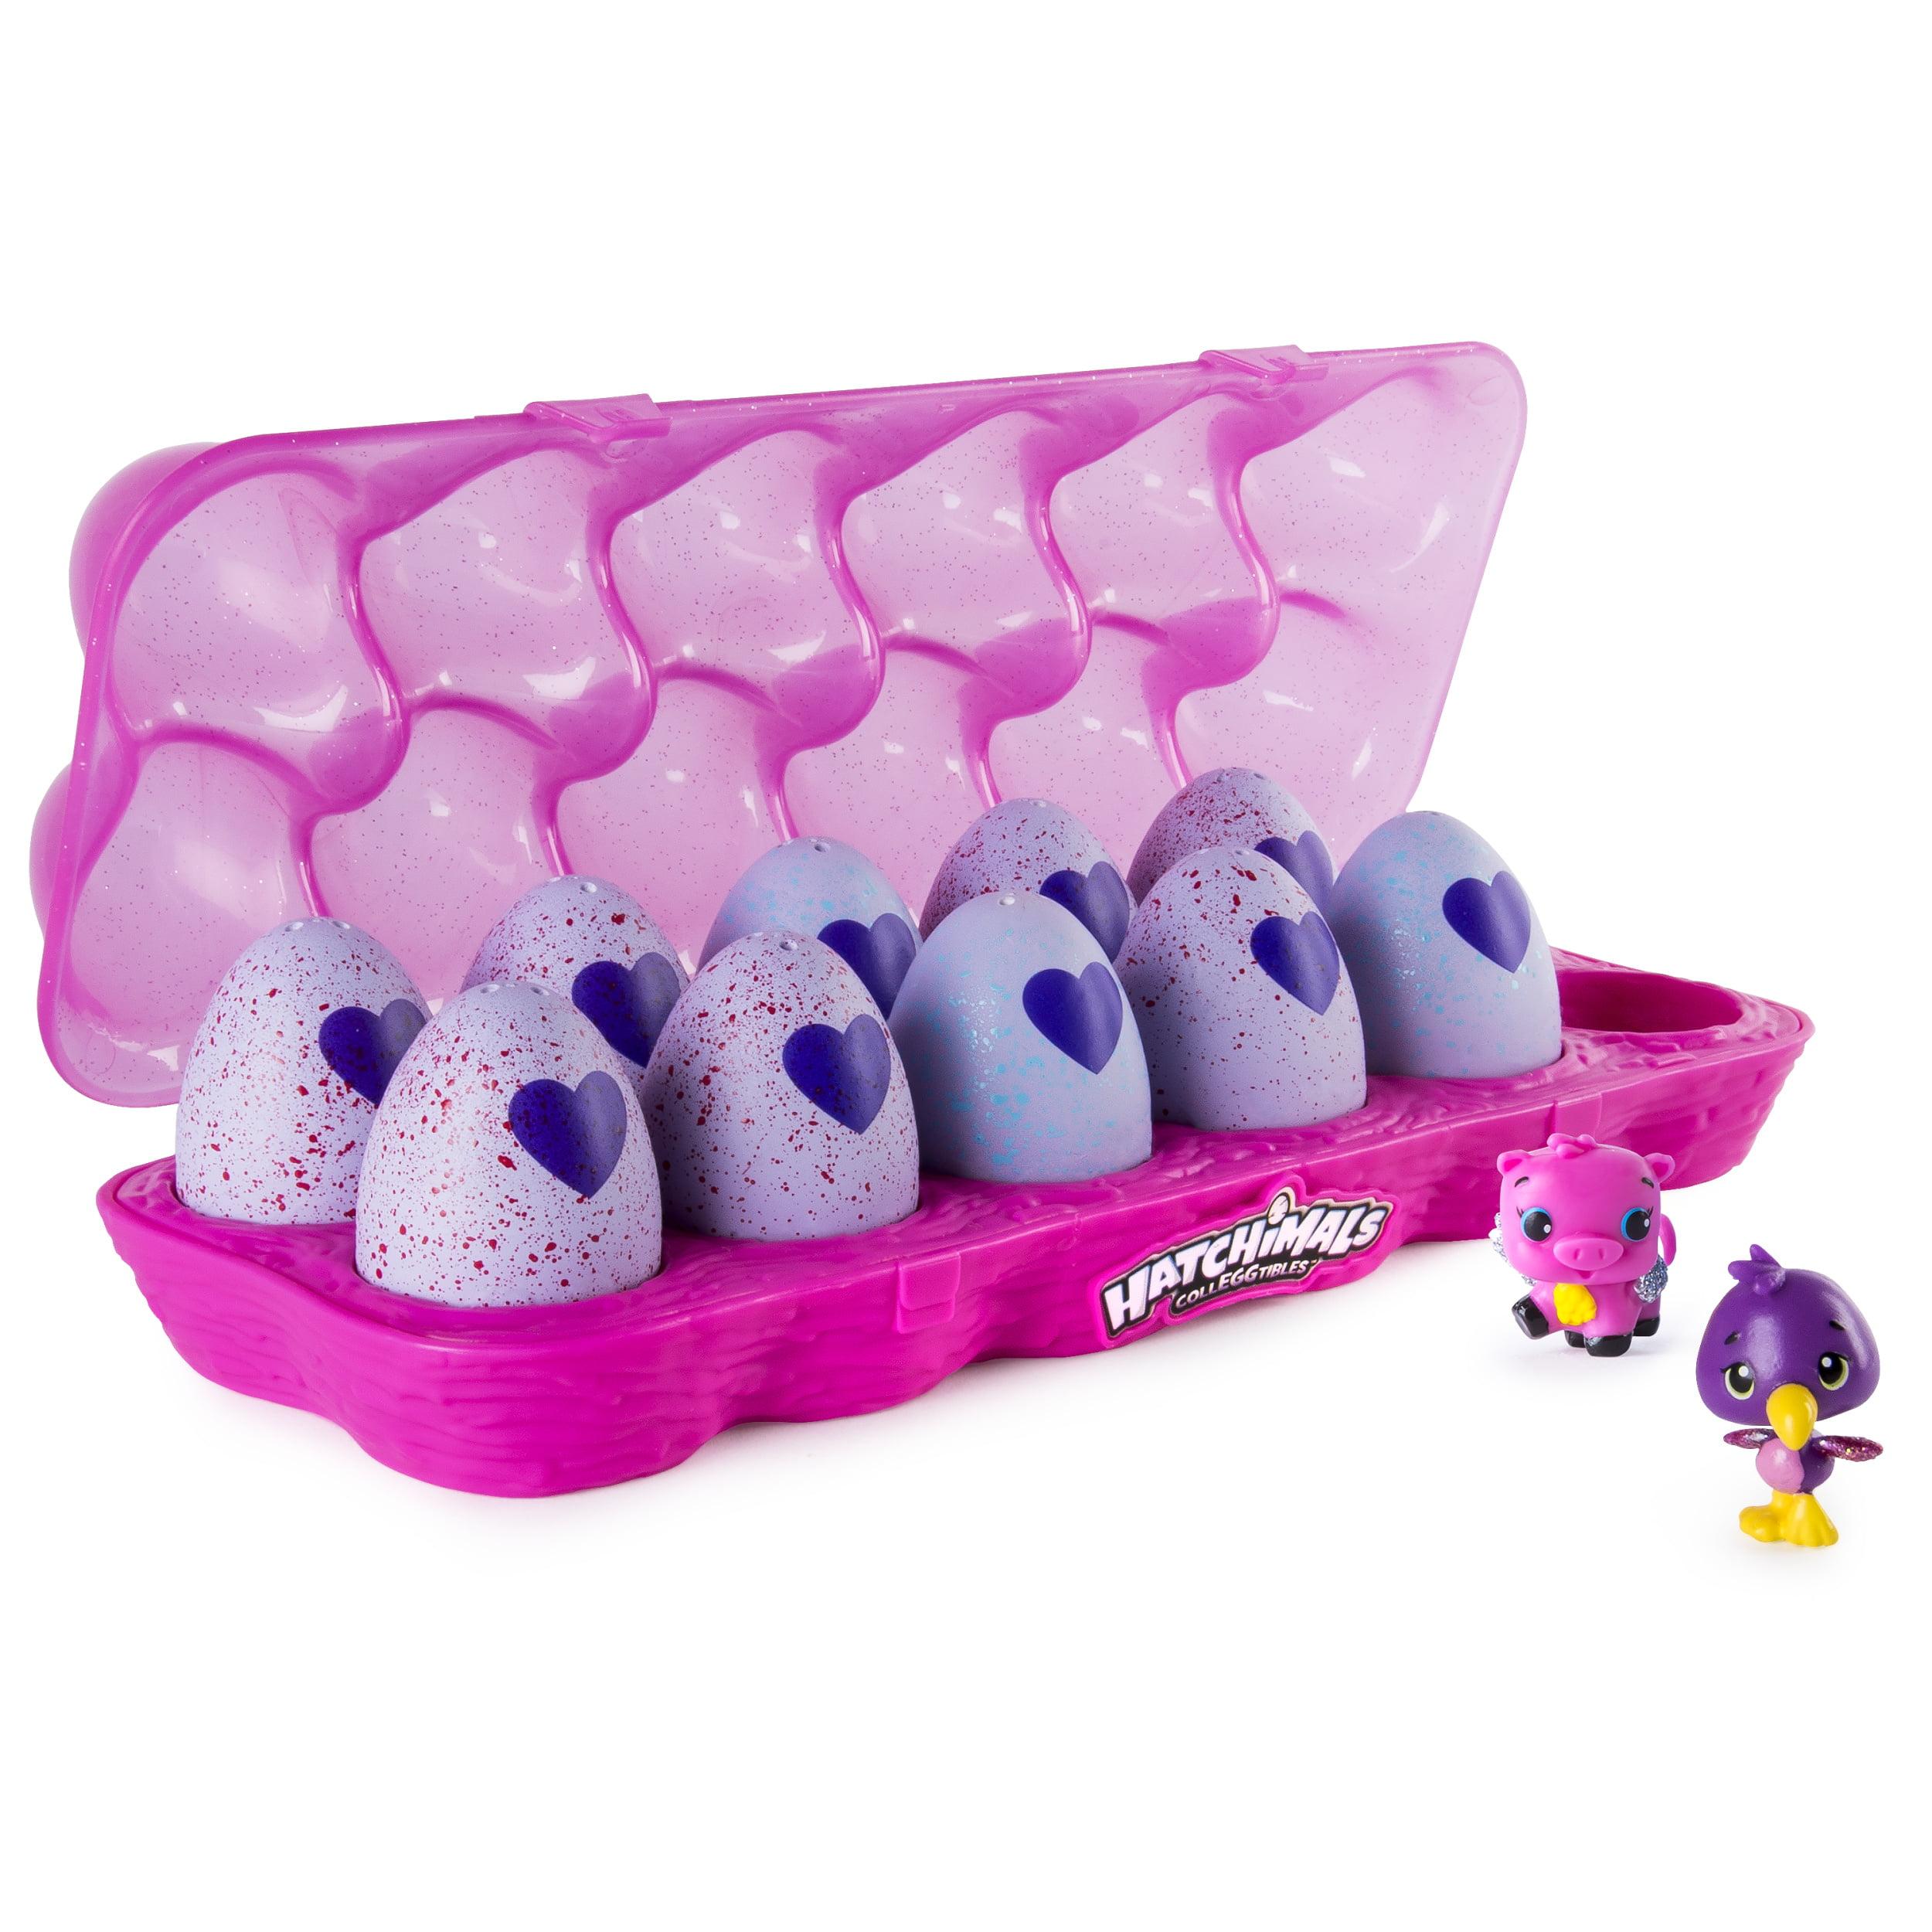 Hatchimals, CollEGGtibles 12 Pack Egg Carton Season 1